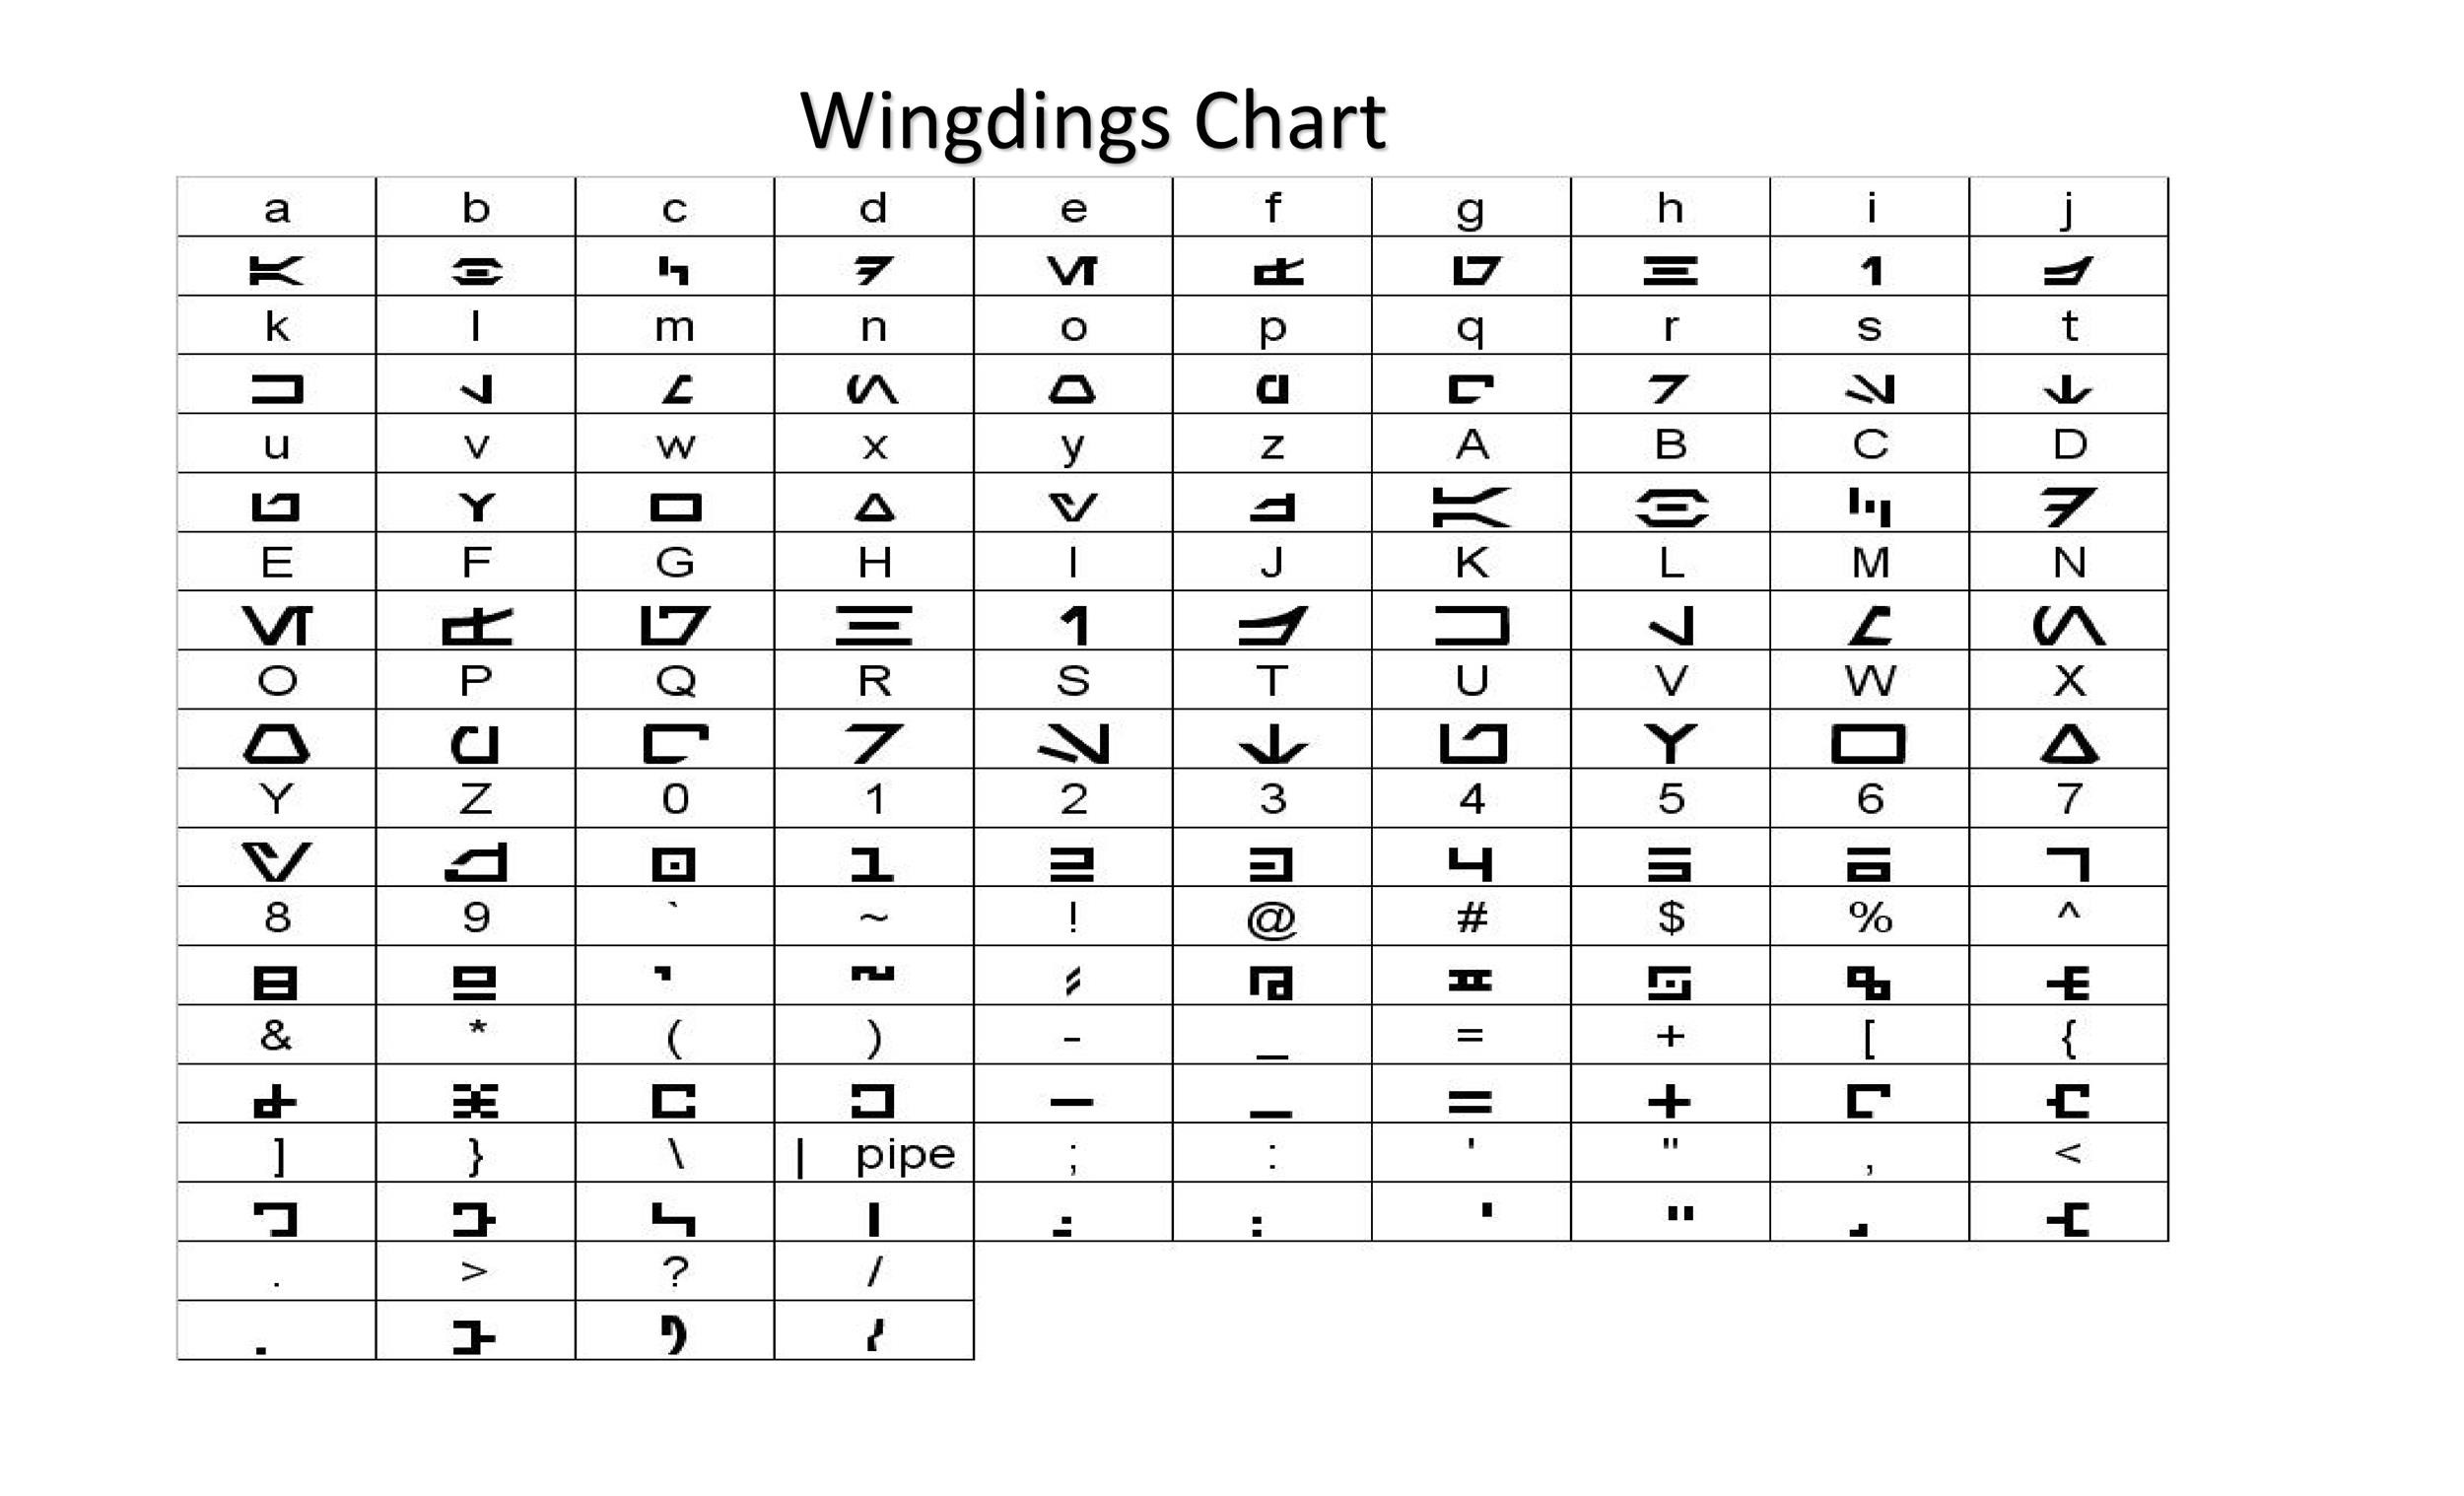 45 Free Wingdings Translator Charts ᐅ Template Lab